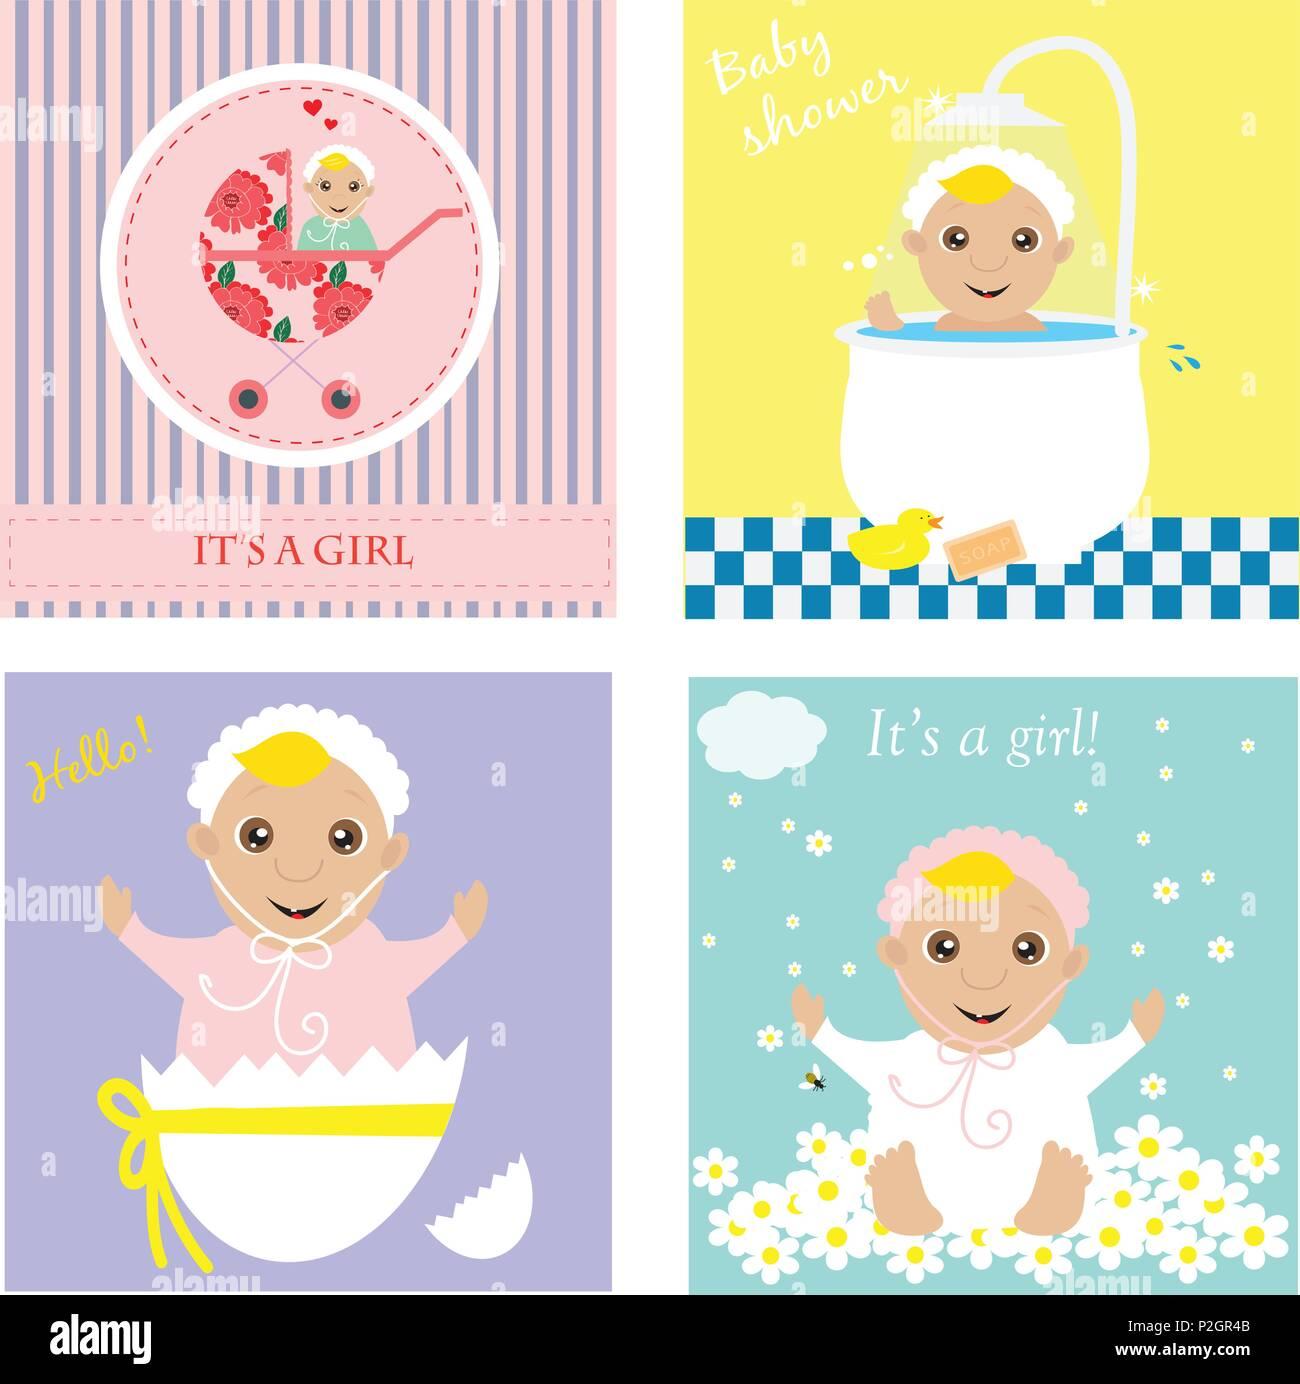 Set of baby shower invitation greeting cardsposter vector set of baby shower invitation greeting cardsposter vector illustrations m4hsunfo